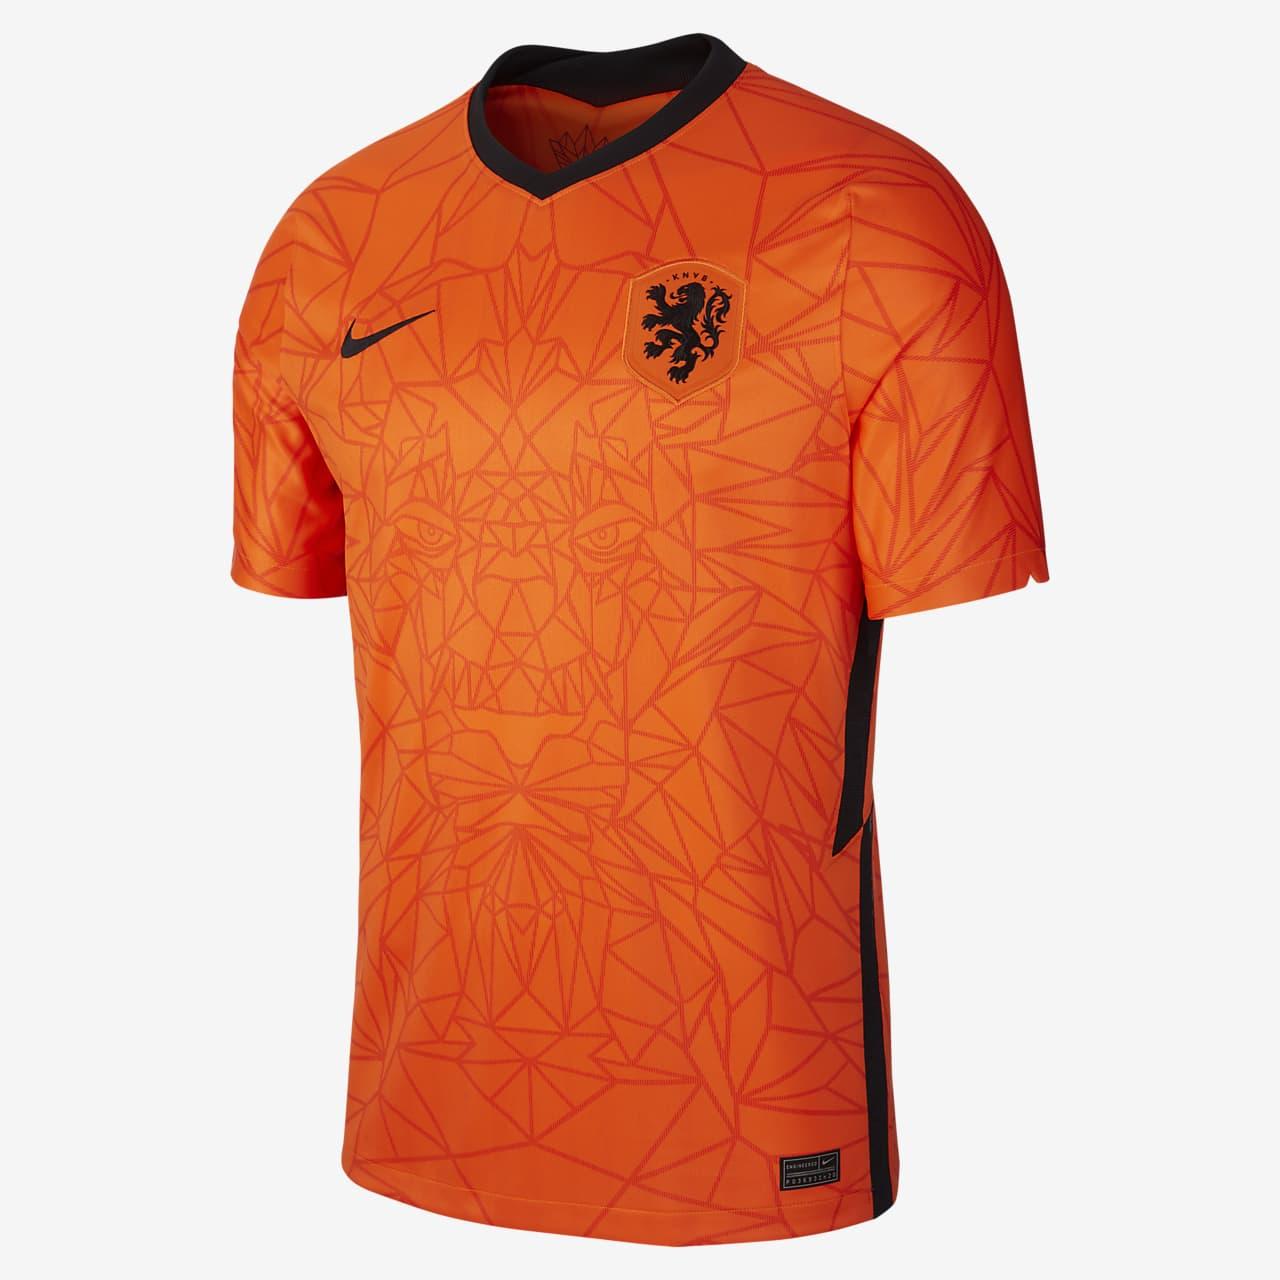 Nederland 2020 Stadium Thuis Voetbalshorts voor heren